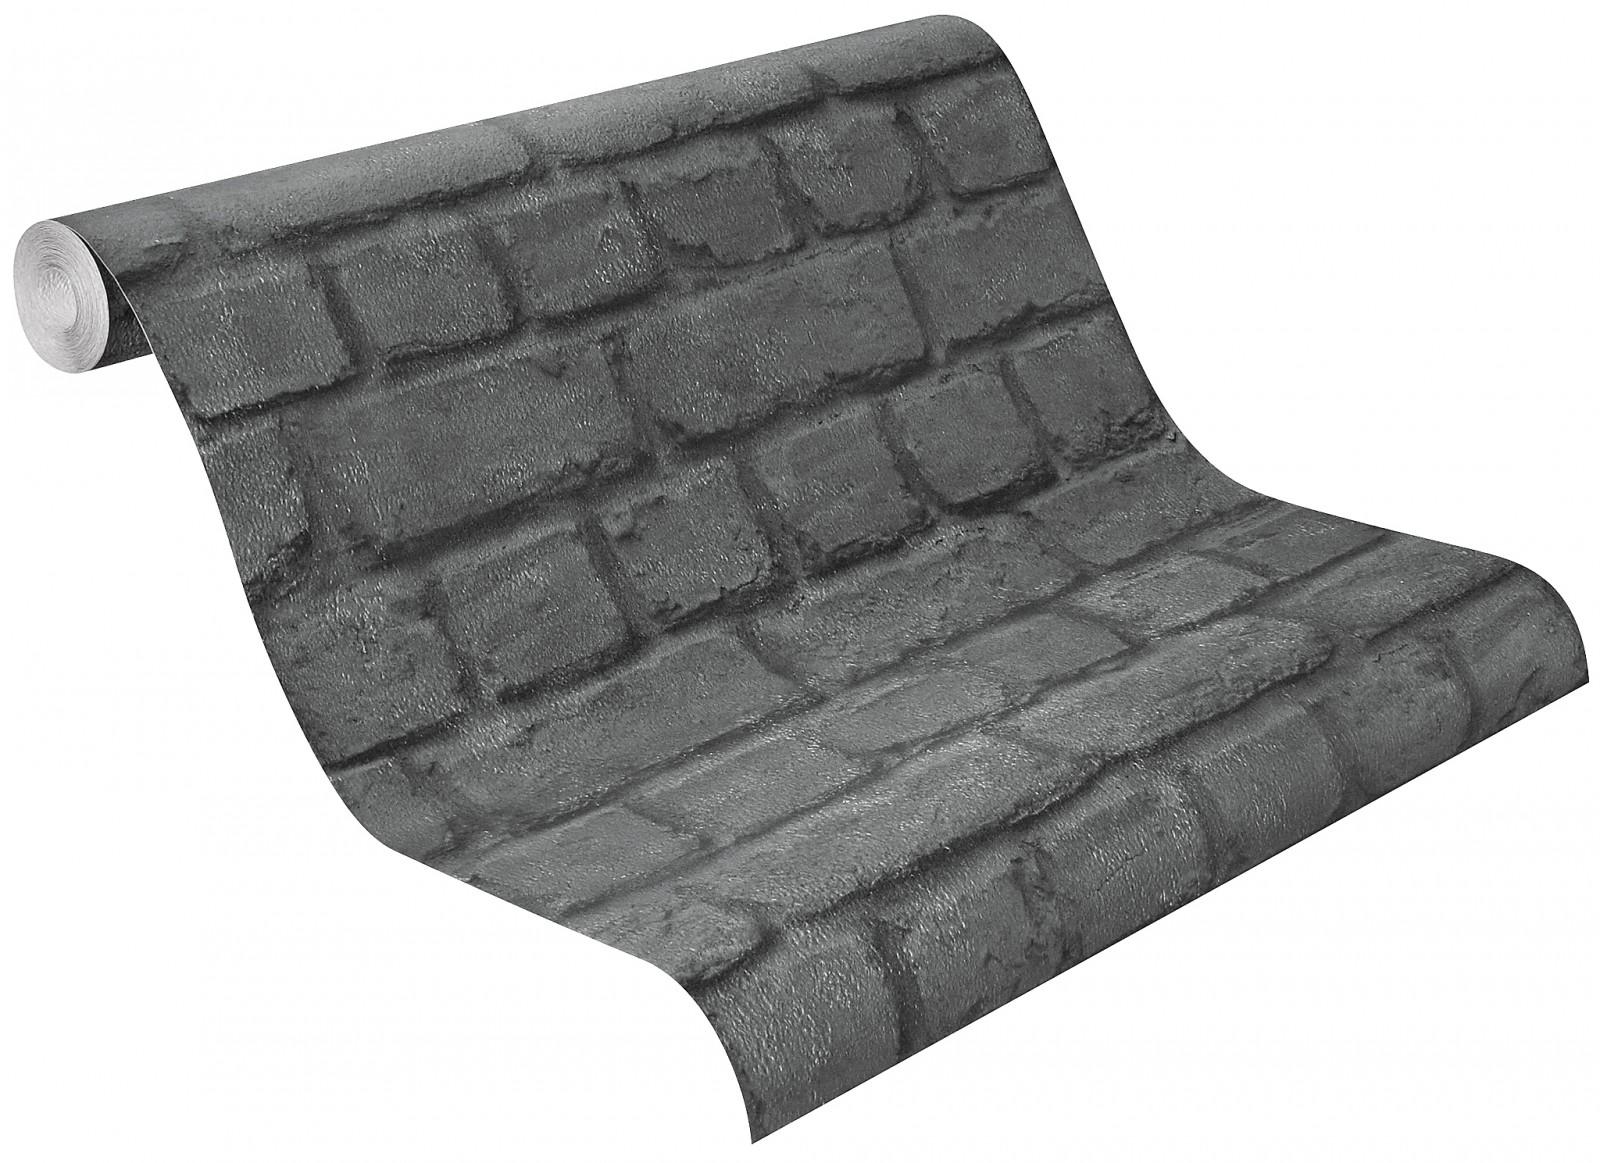 rasch tapete aqua relief steine anthrazit. Black Bedroom Furniture Sets. Home Design Ideas